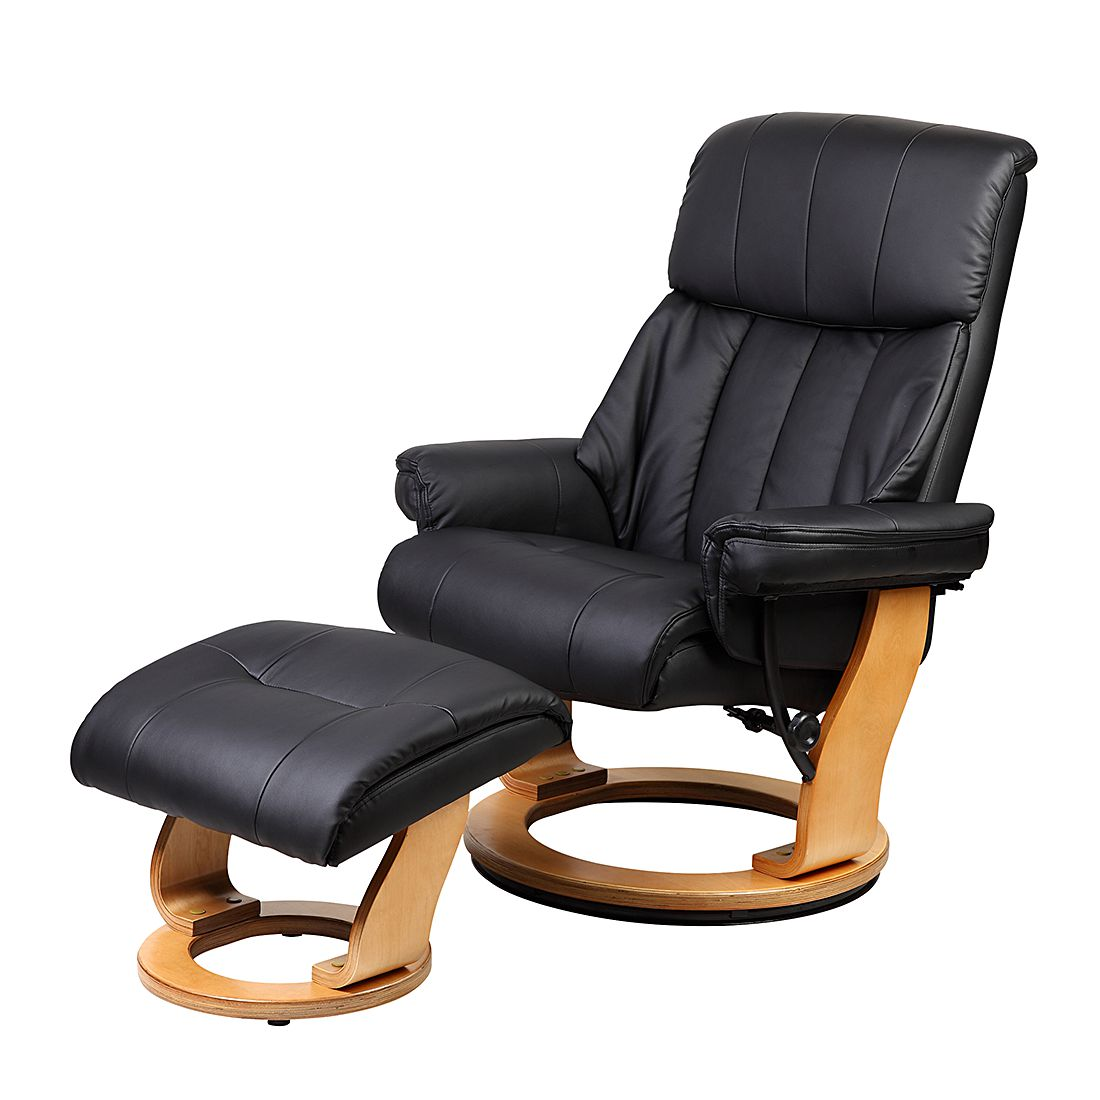 relaxsessel mit seite 8 preisvergleich. Black Bedroom Furniture Sets. Home Design Ideas